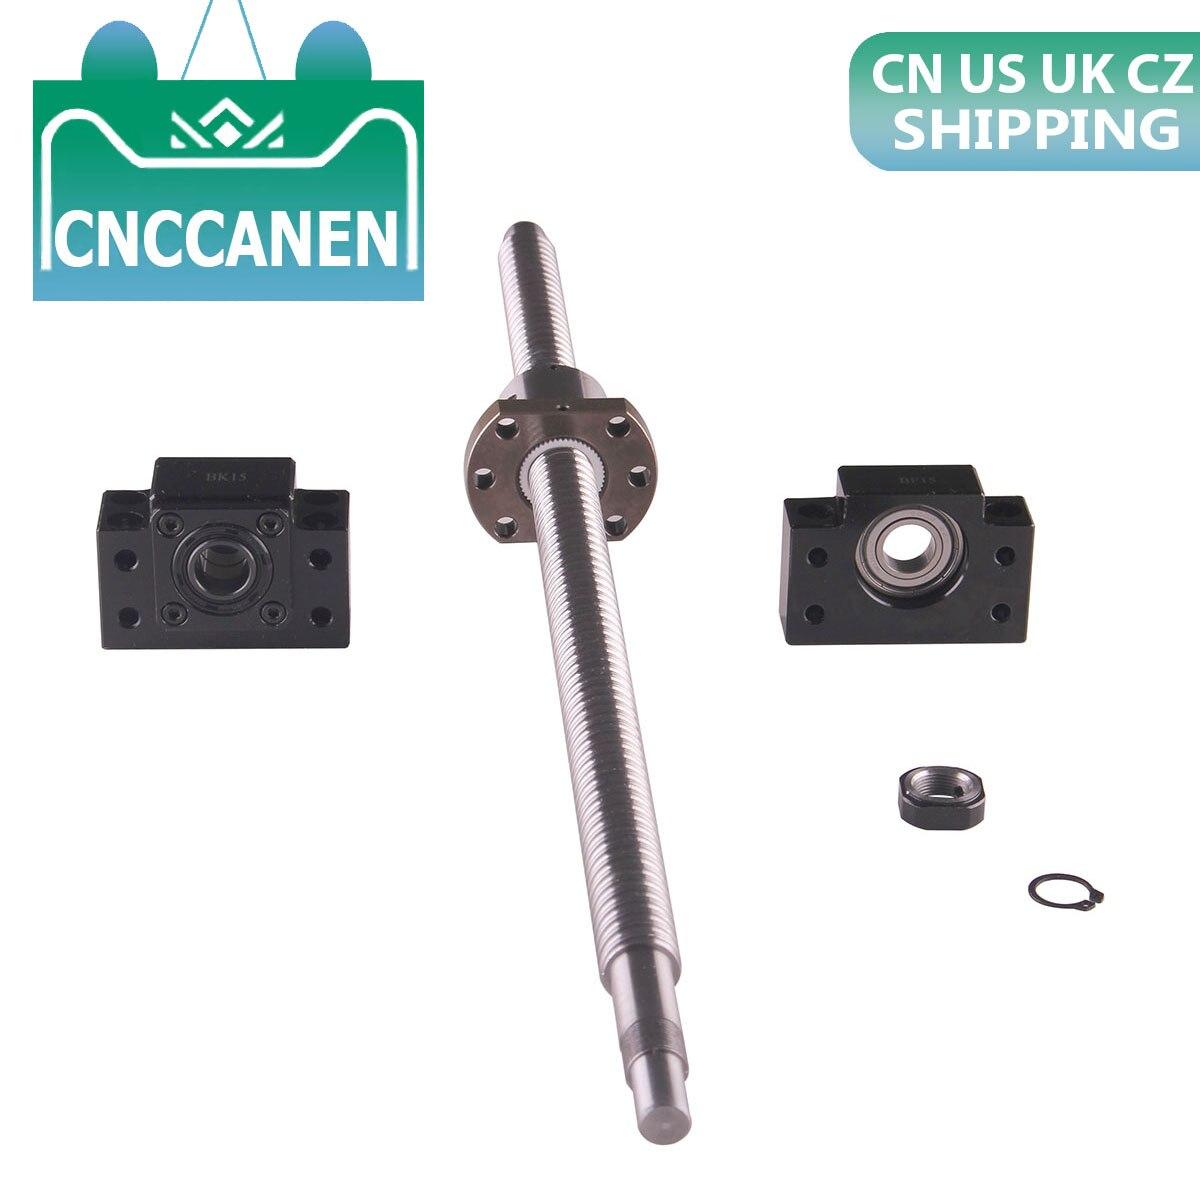 Ballscrew SFU2005 Length 400mm 500mm 600mm 800mm 1000mm 1500mm 1600mm RM2005 Ball Screw End Machined &Ballnut & BK15&BF15 Set